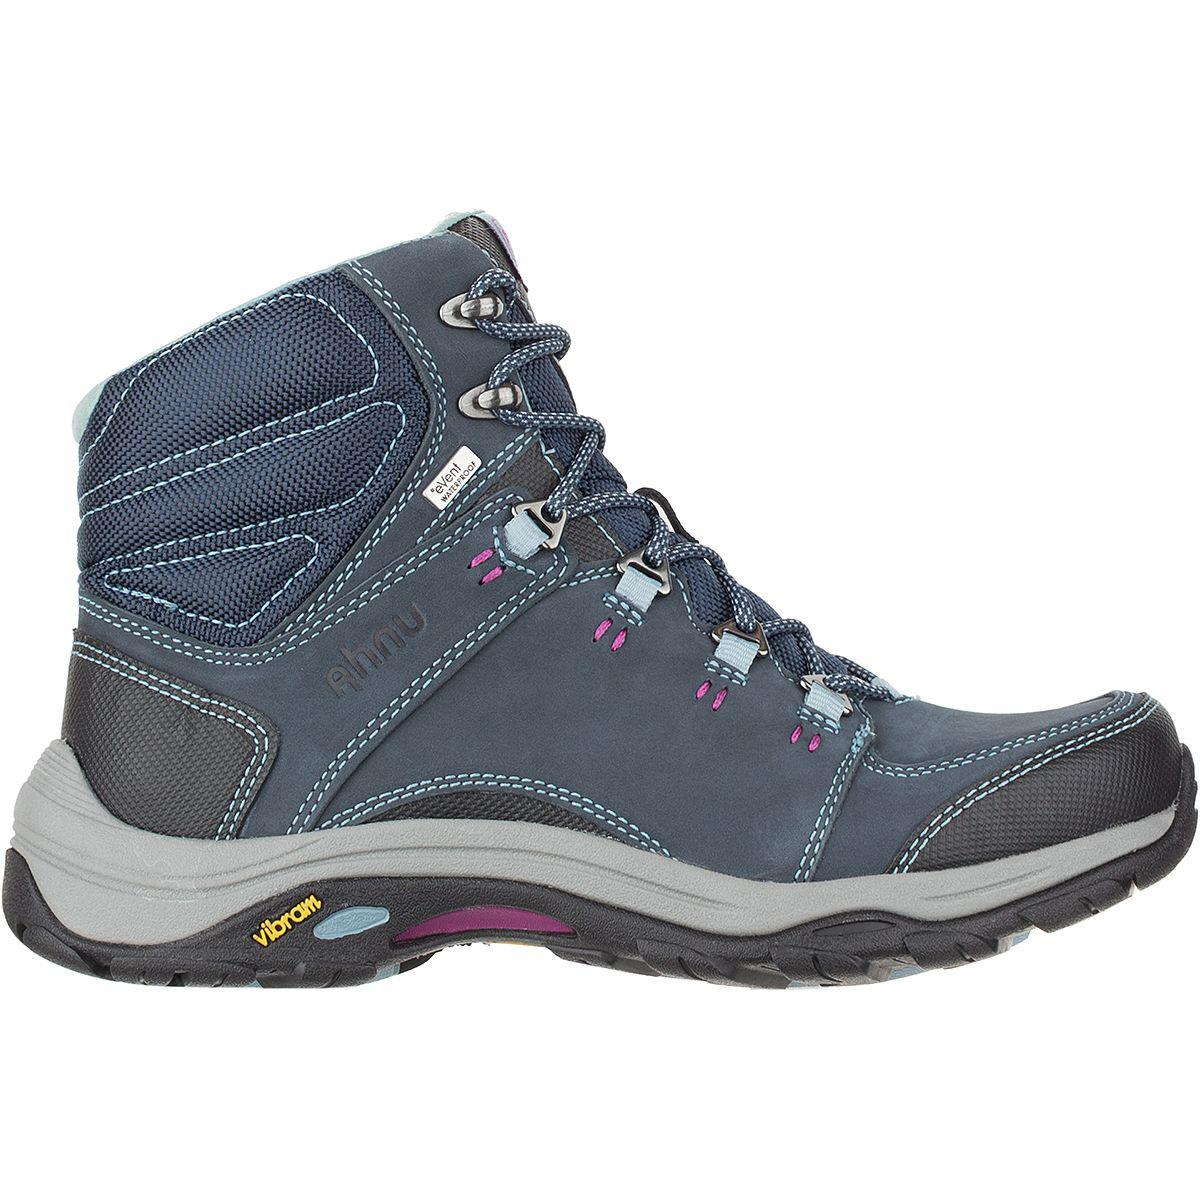 714e9b03529 Lyst - Ahnu Montara Iii Event Hiking Boot in Blue for Men